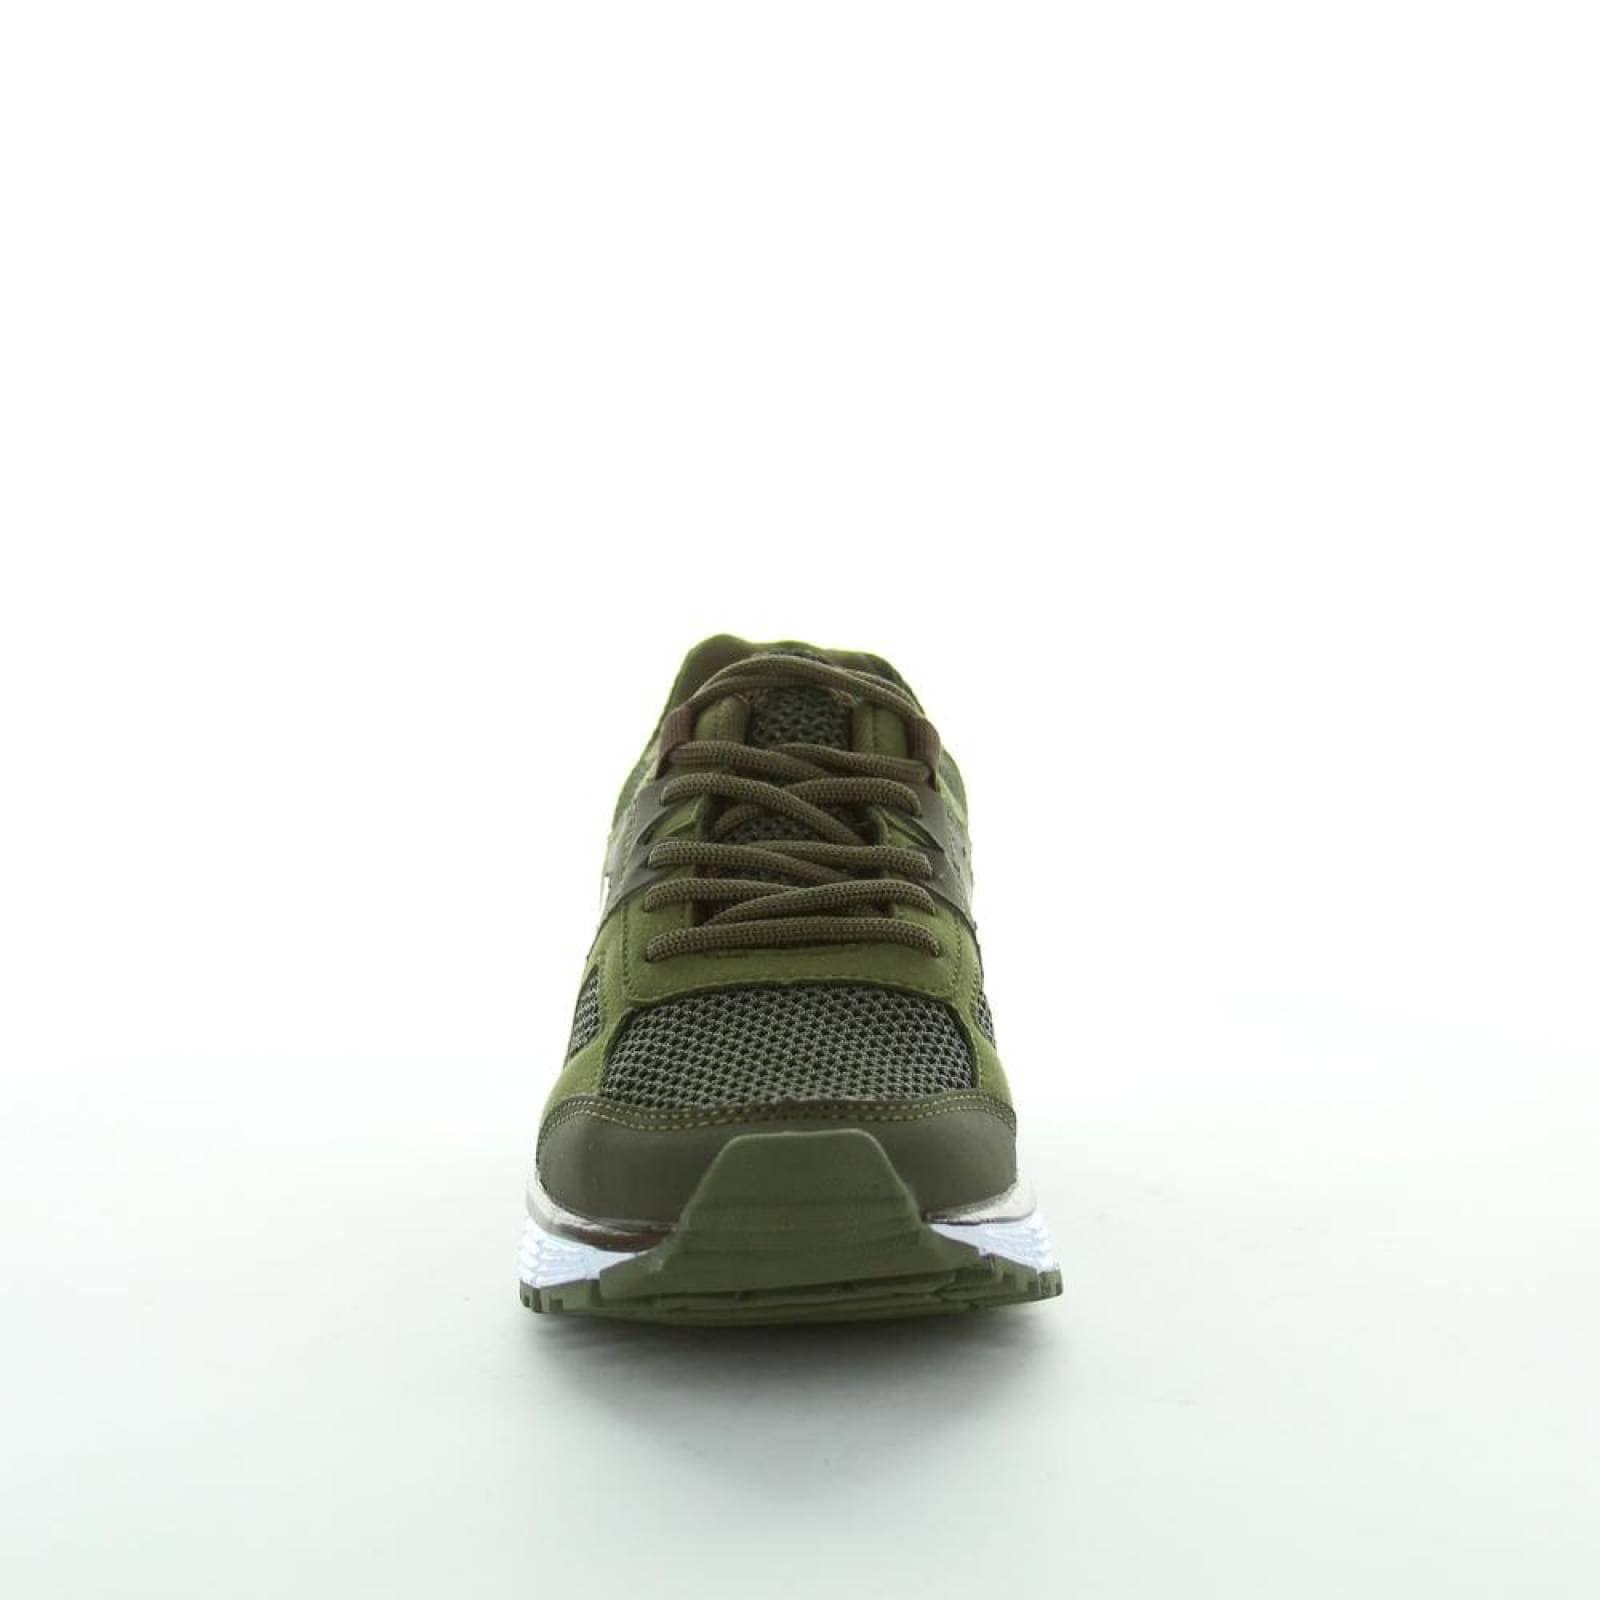 Tenis Brakers Niño Verde Textil 116